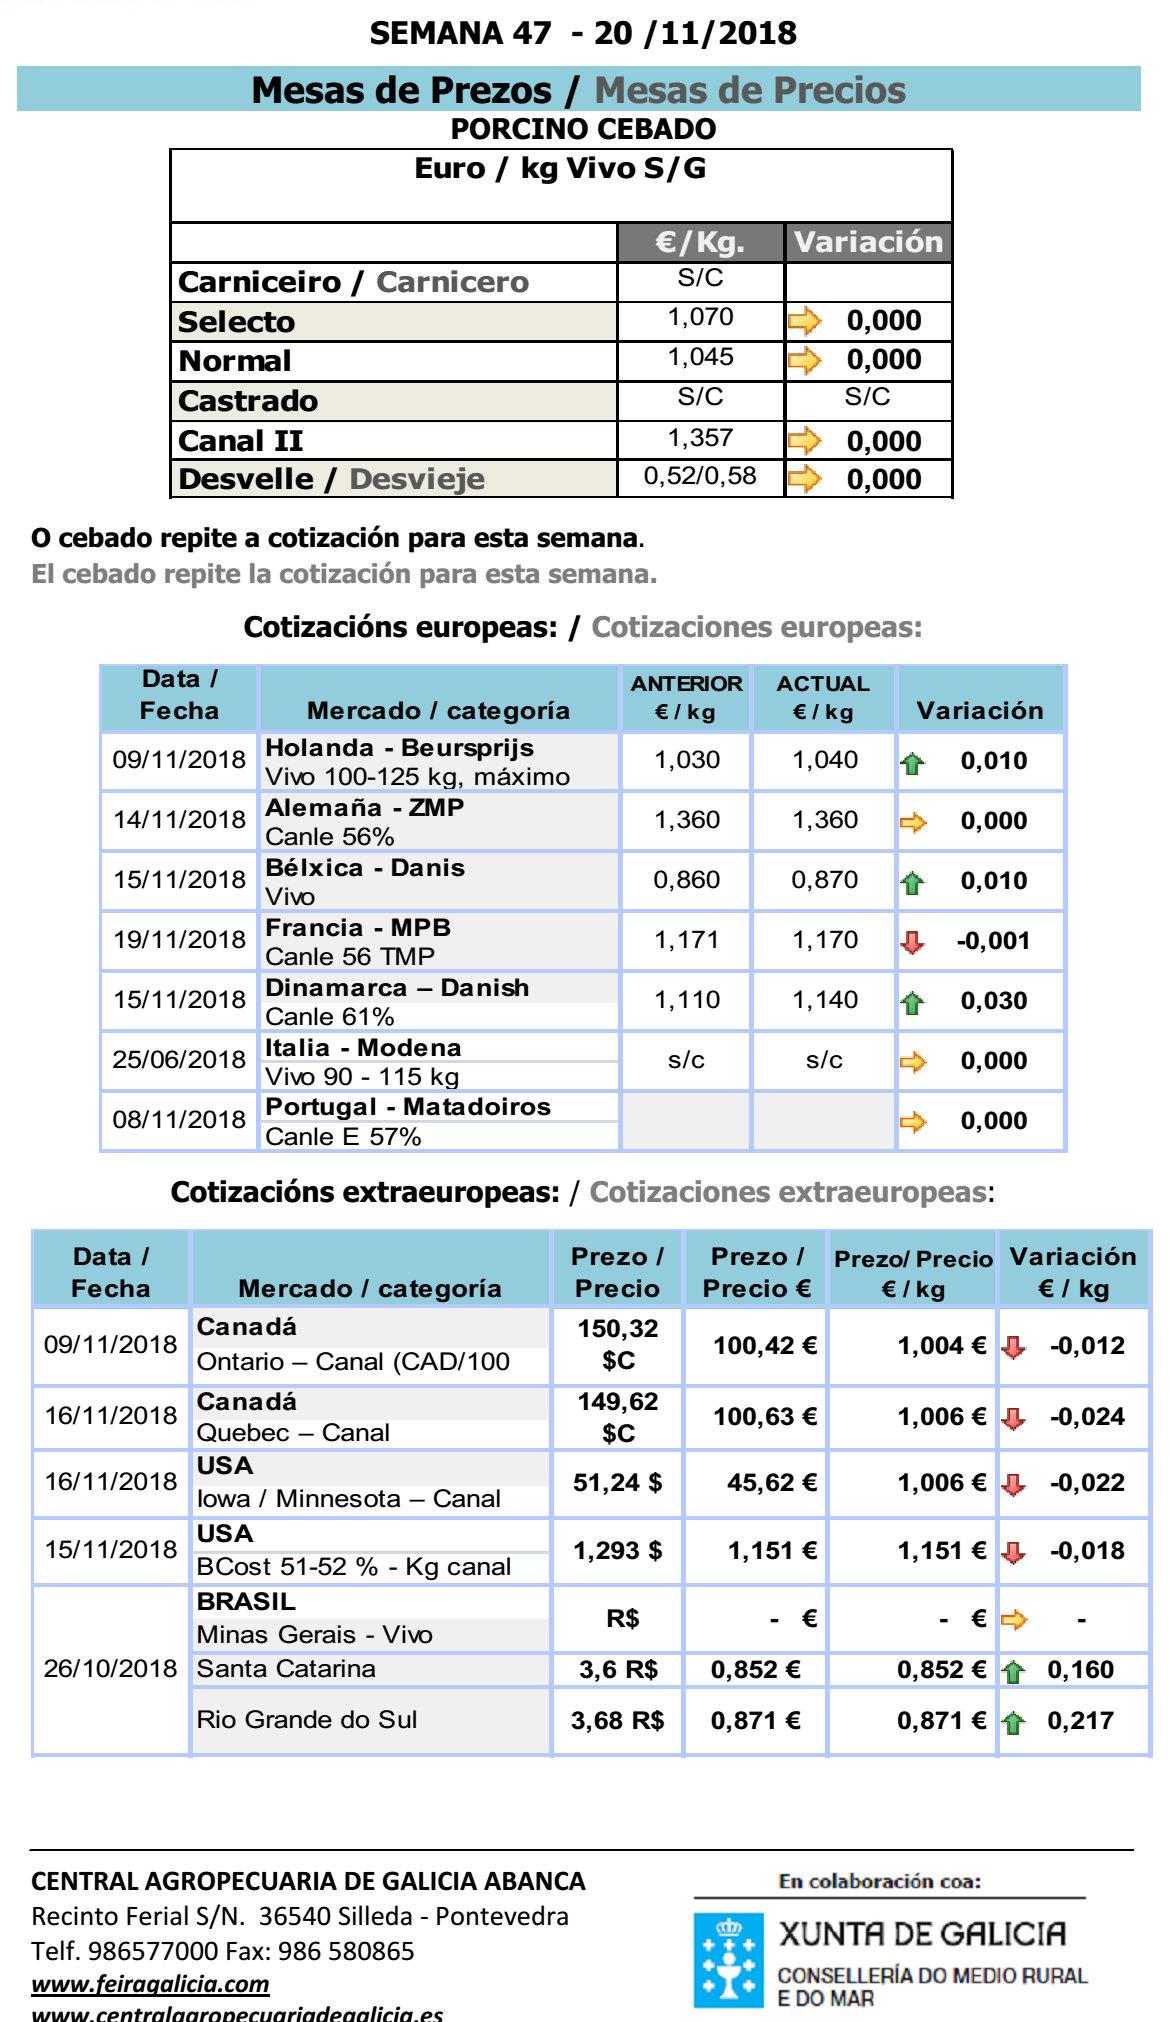 SILLEDA_PORCINO_18_11_4